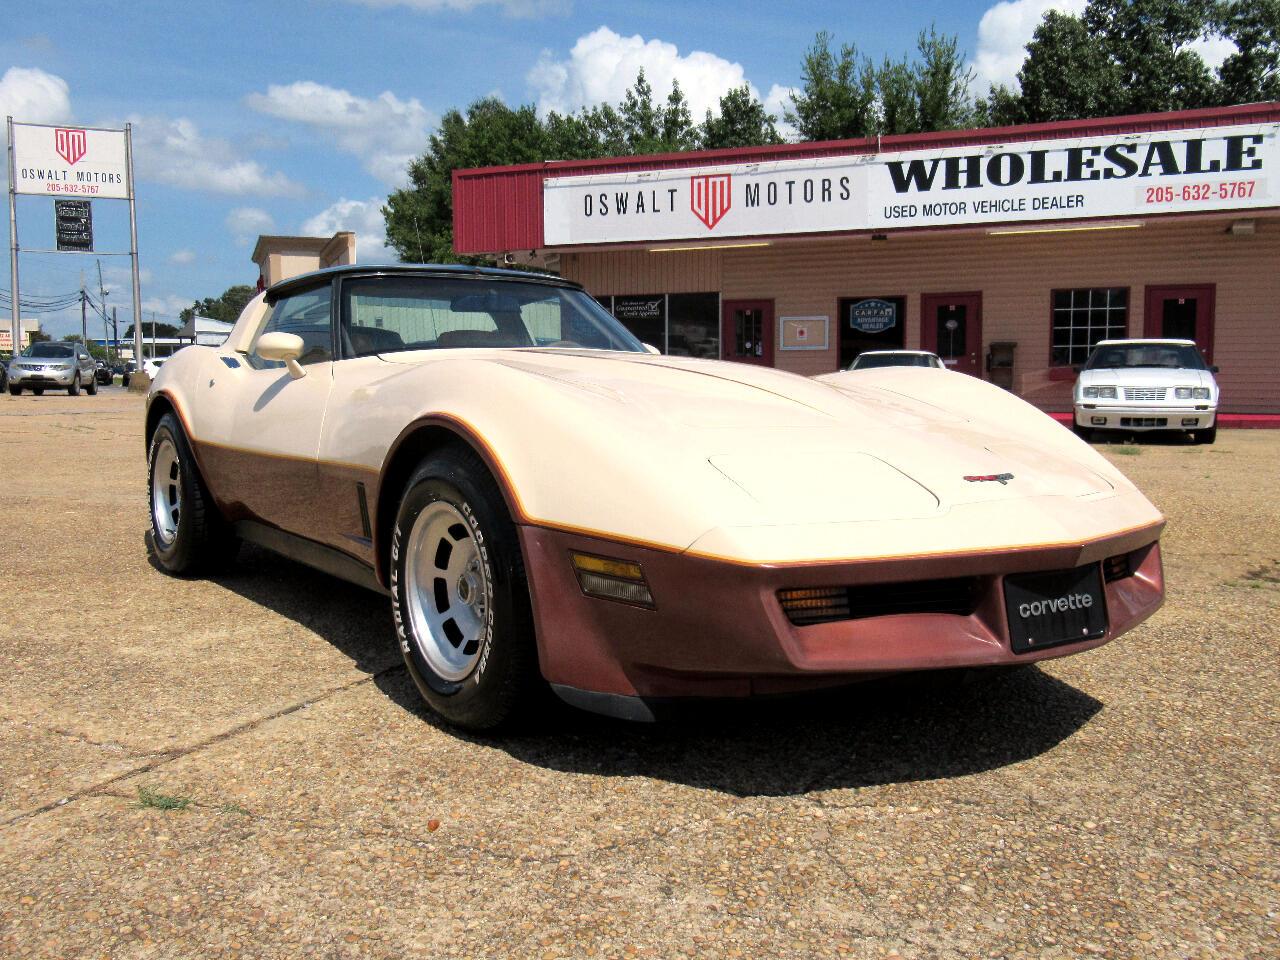 1981 Chevrolet Corvette Bowling Green Edition / 1LT